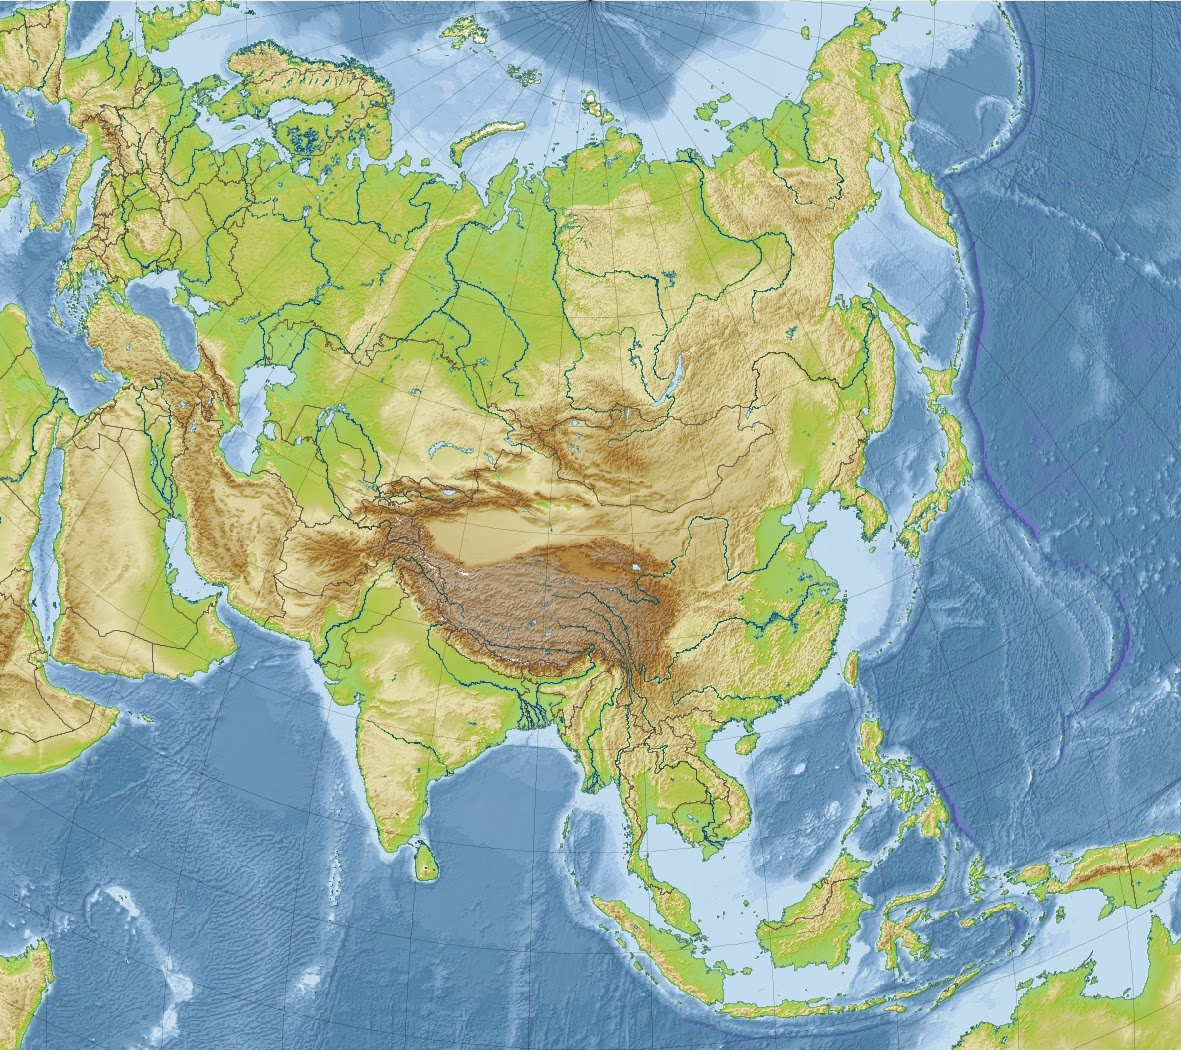 Mapa Mudo Asia Fisico.Juegos De Geografia Juego De Relieve De Asia Mapa Mudo